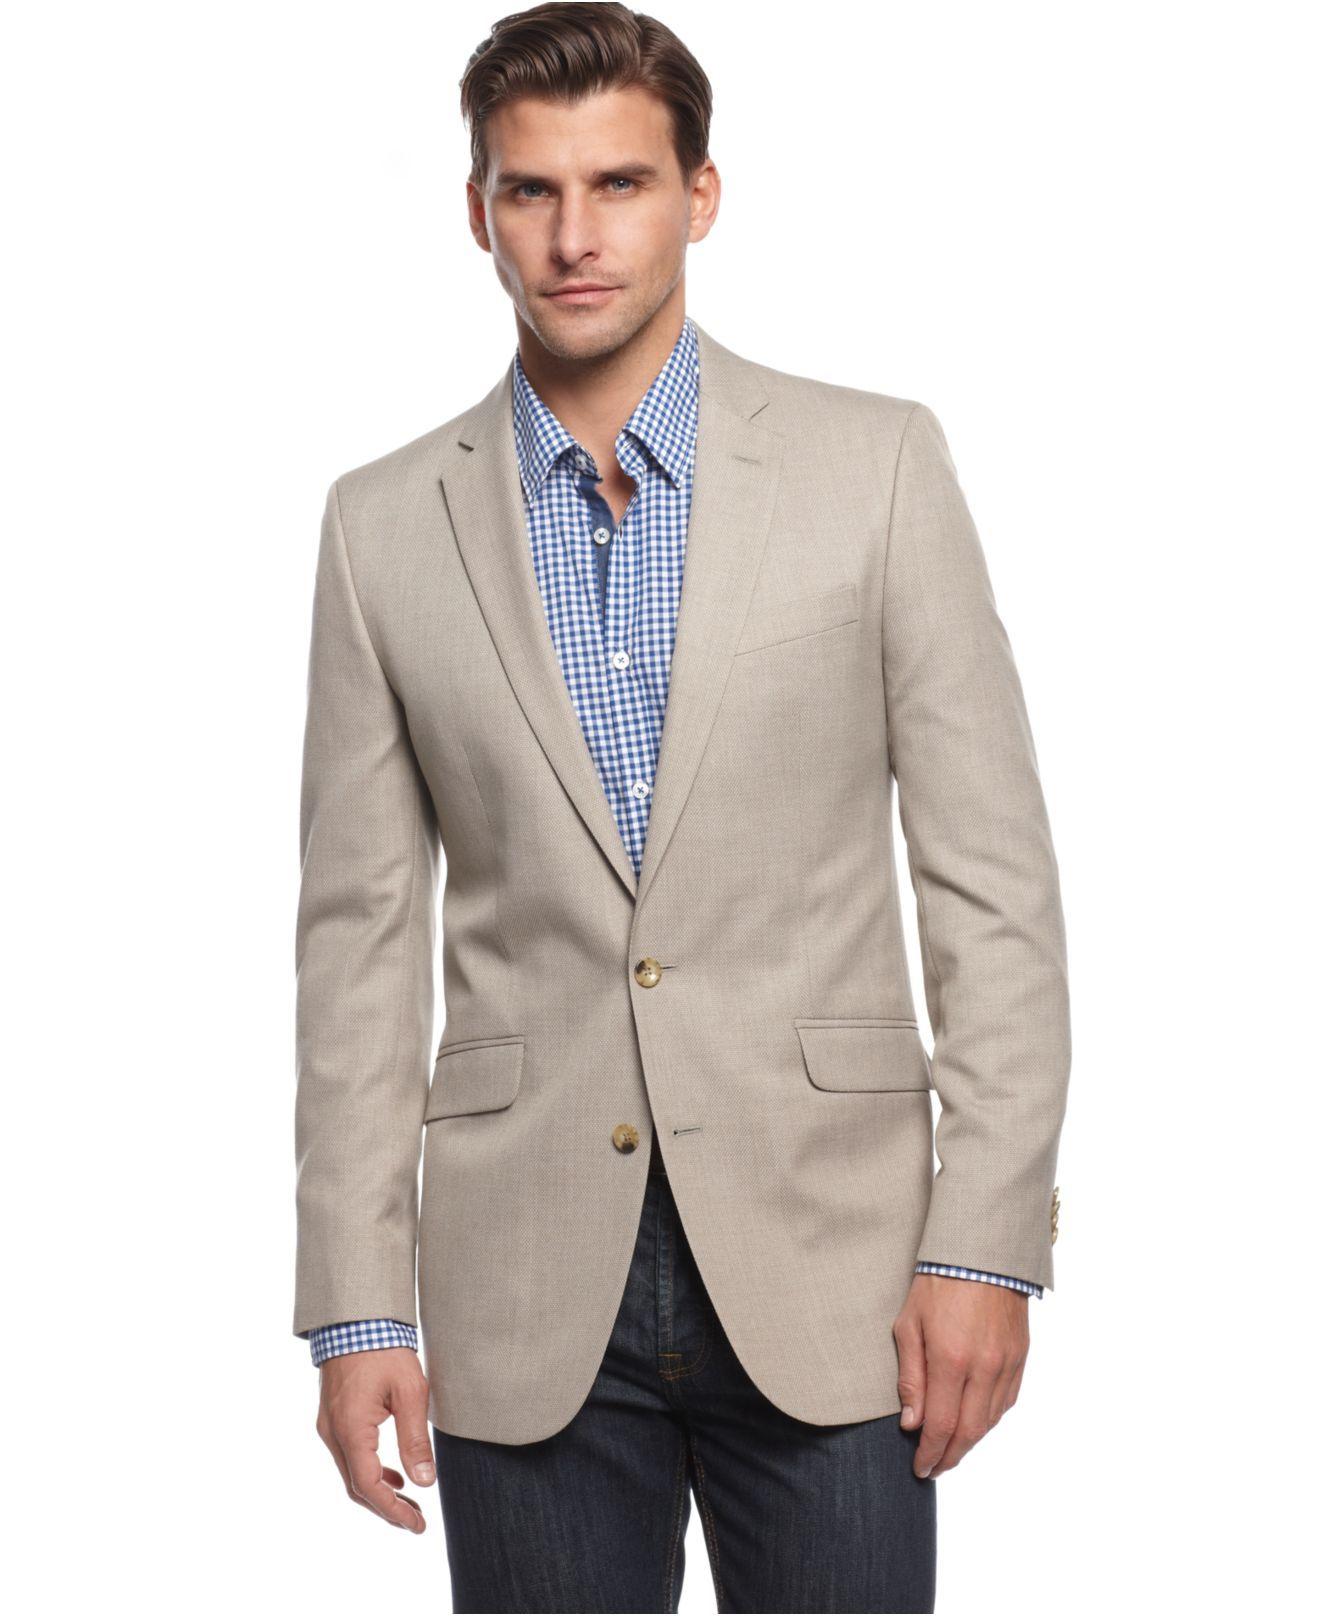 Cole Reaction Jacket, Tan Solid Blazer Mens